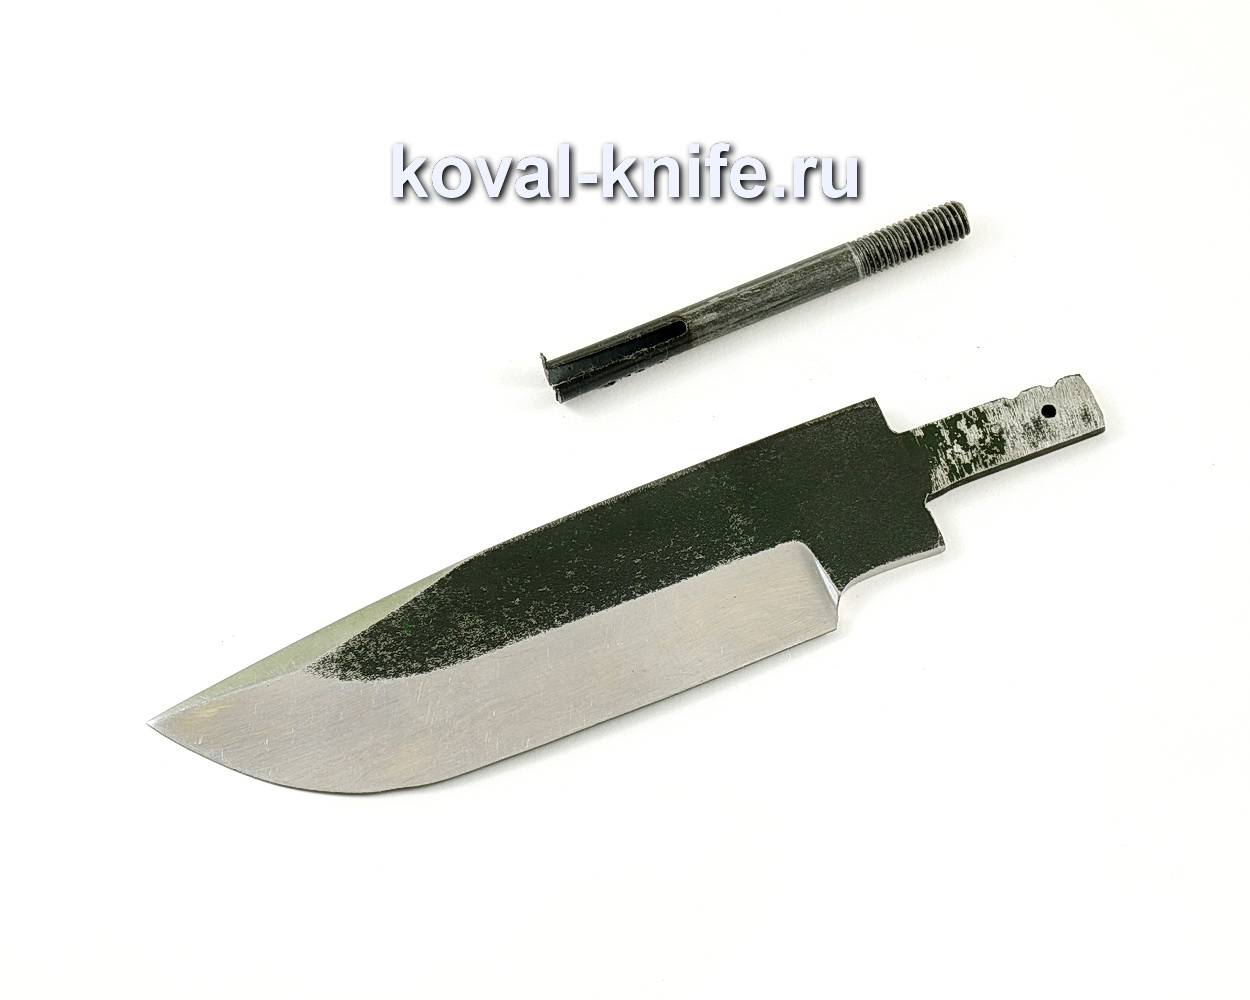 Клинок для ножа Барс (кованая сталь 95Х18)